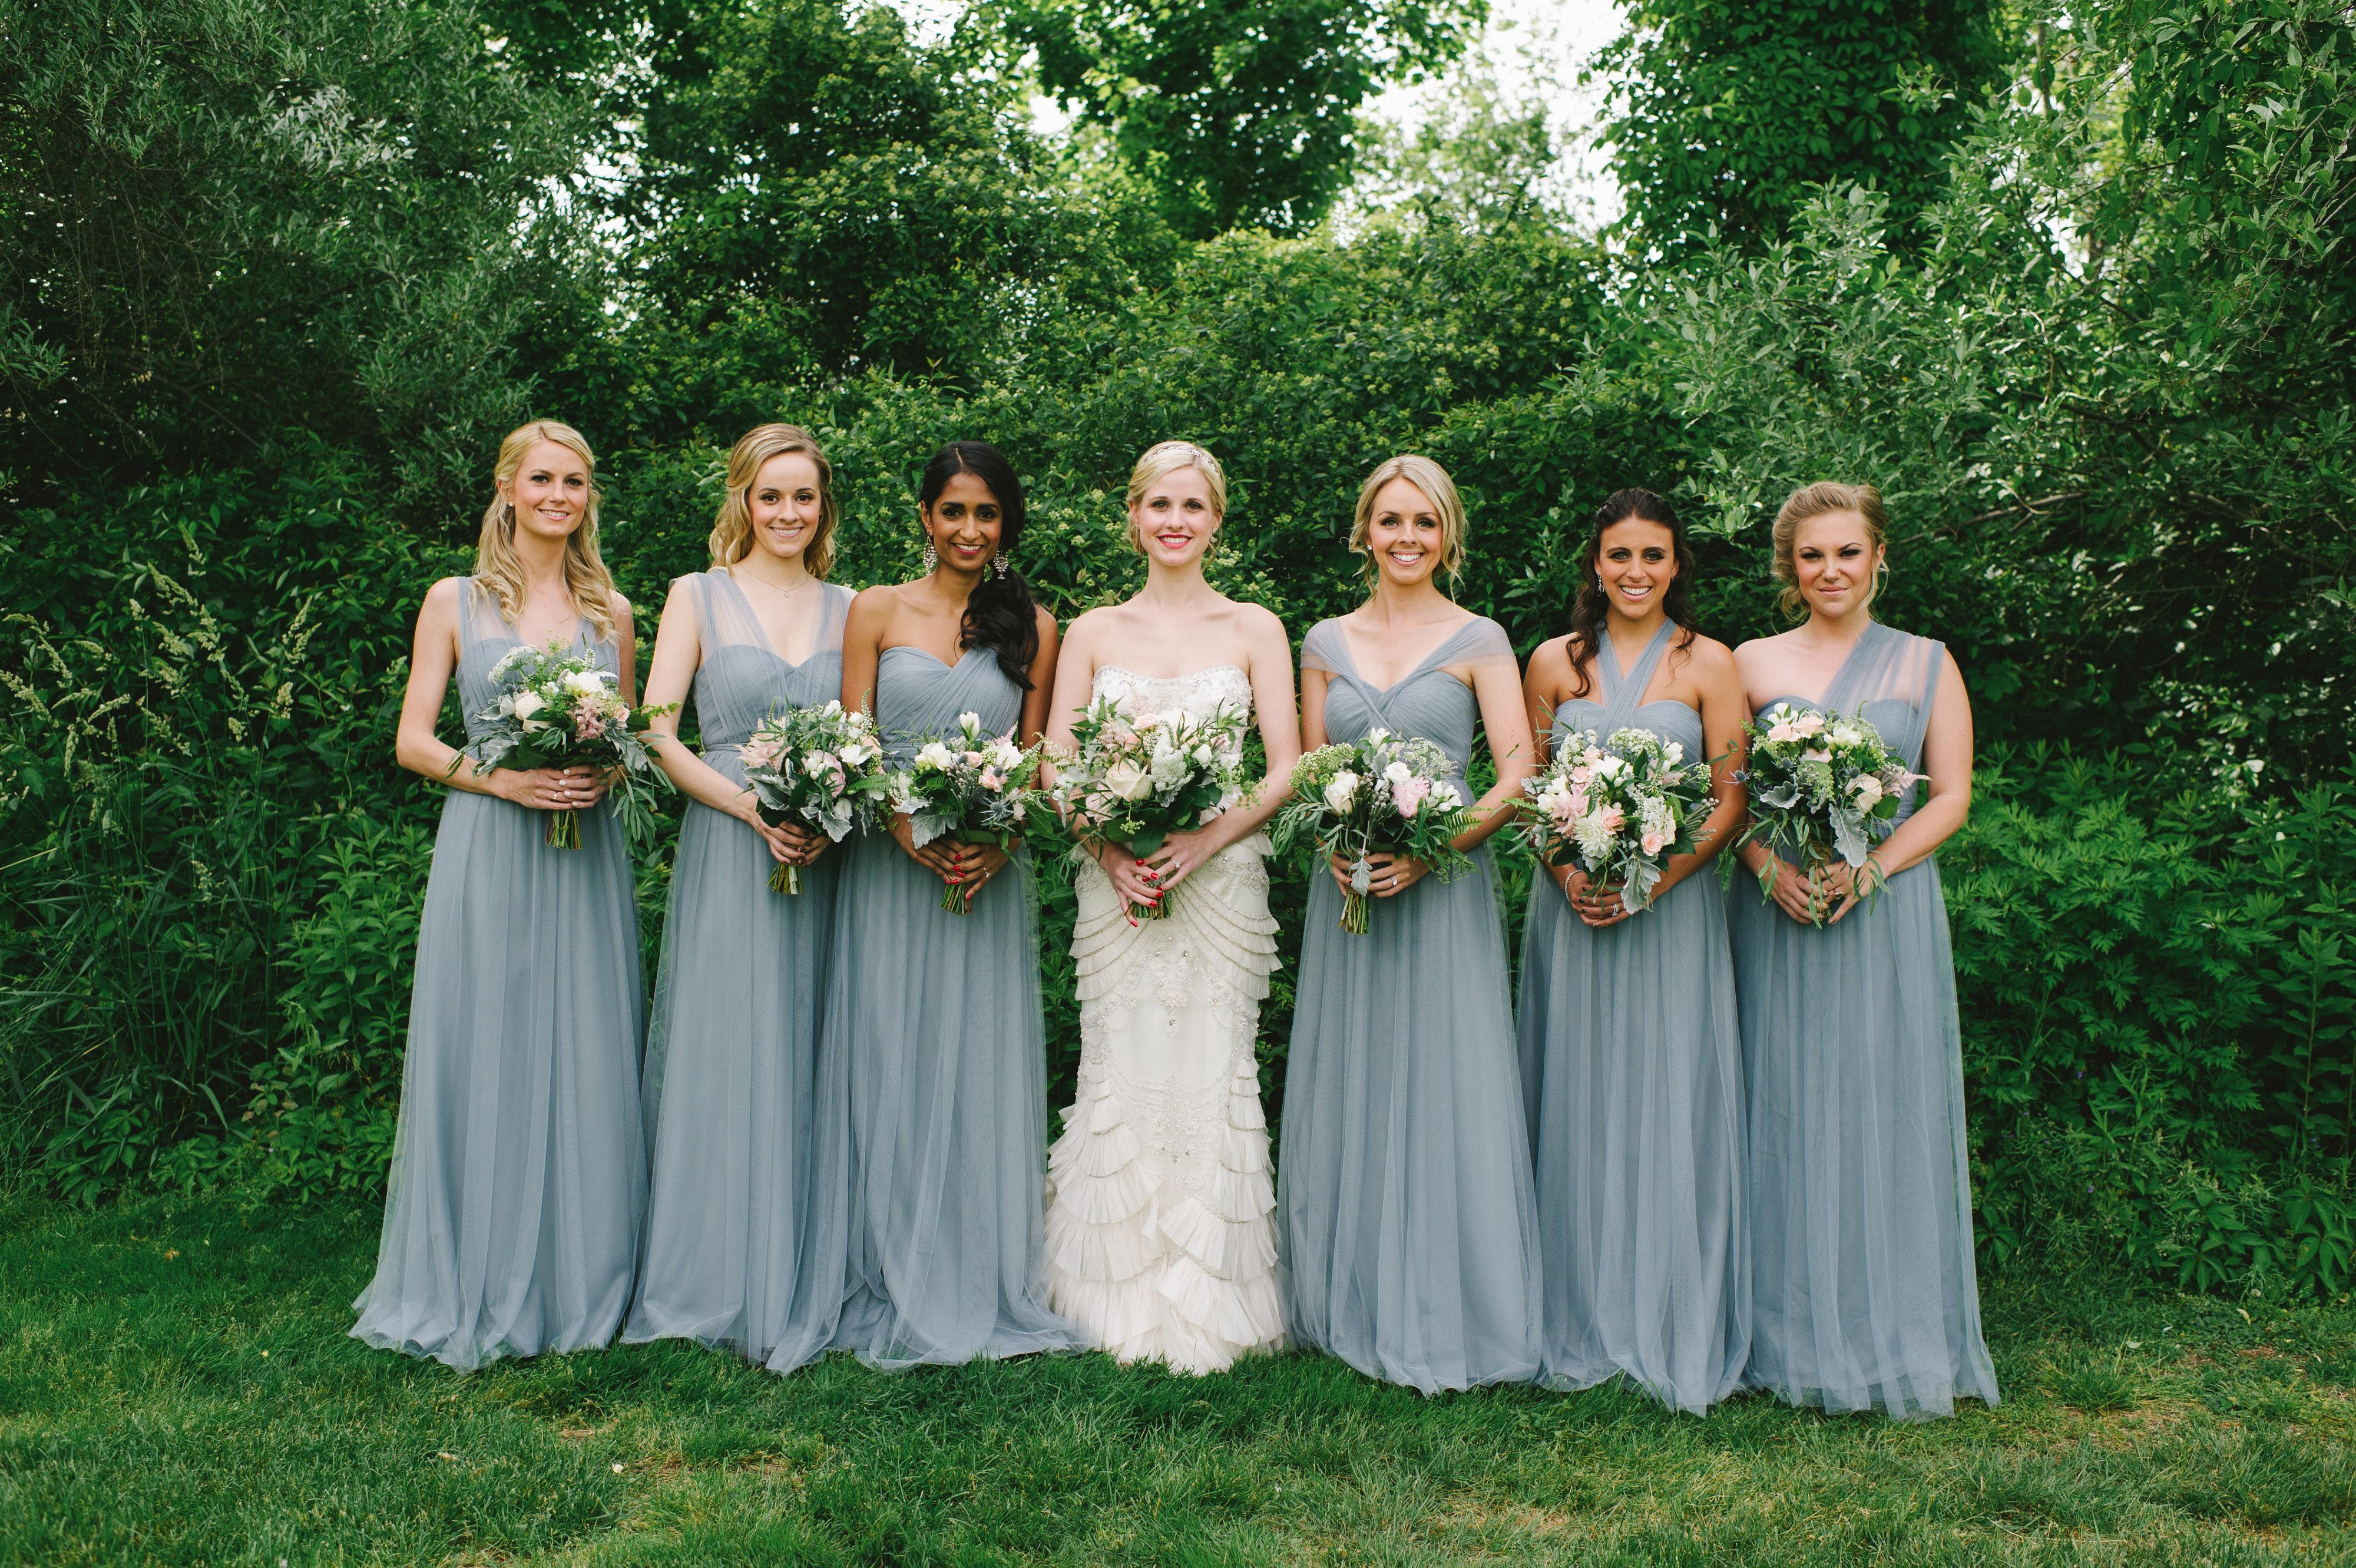 jenni levine bridesmaids